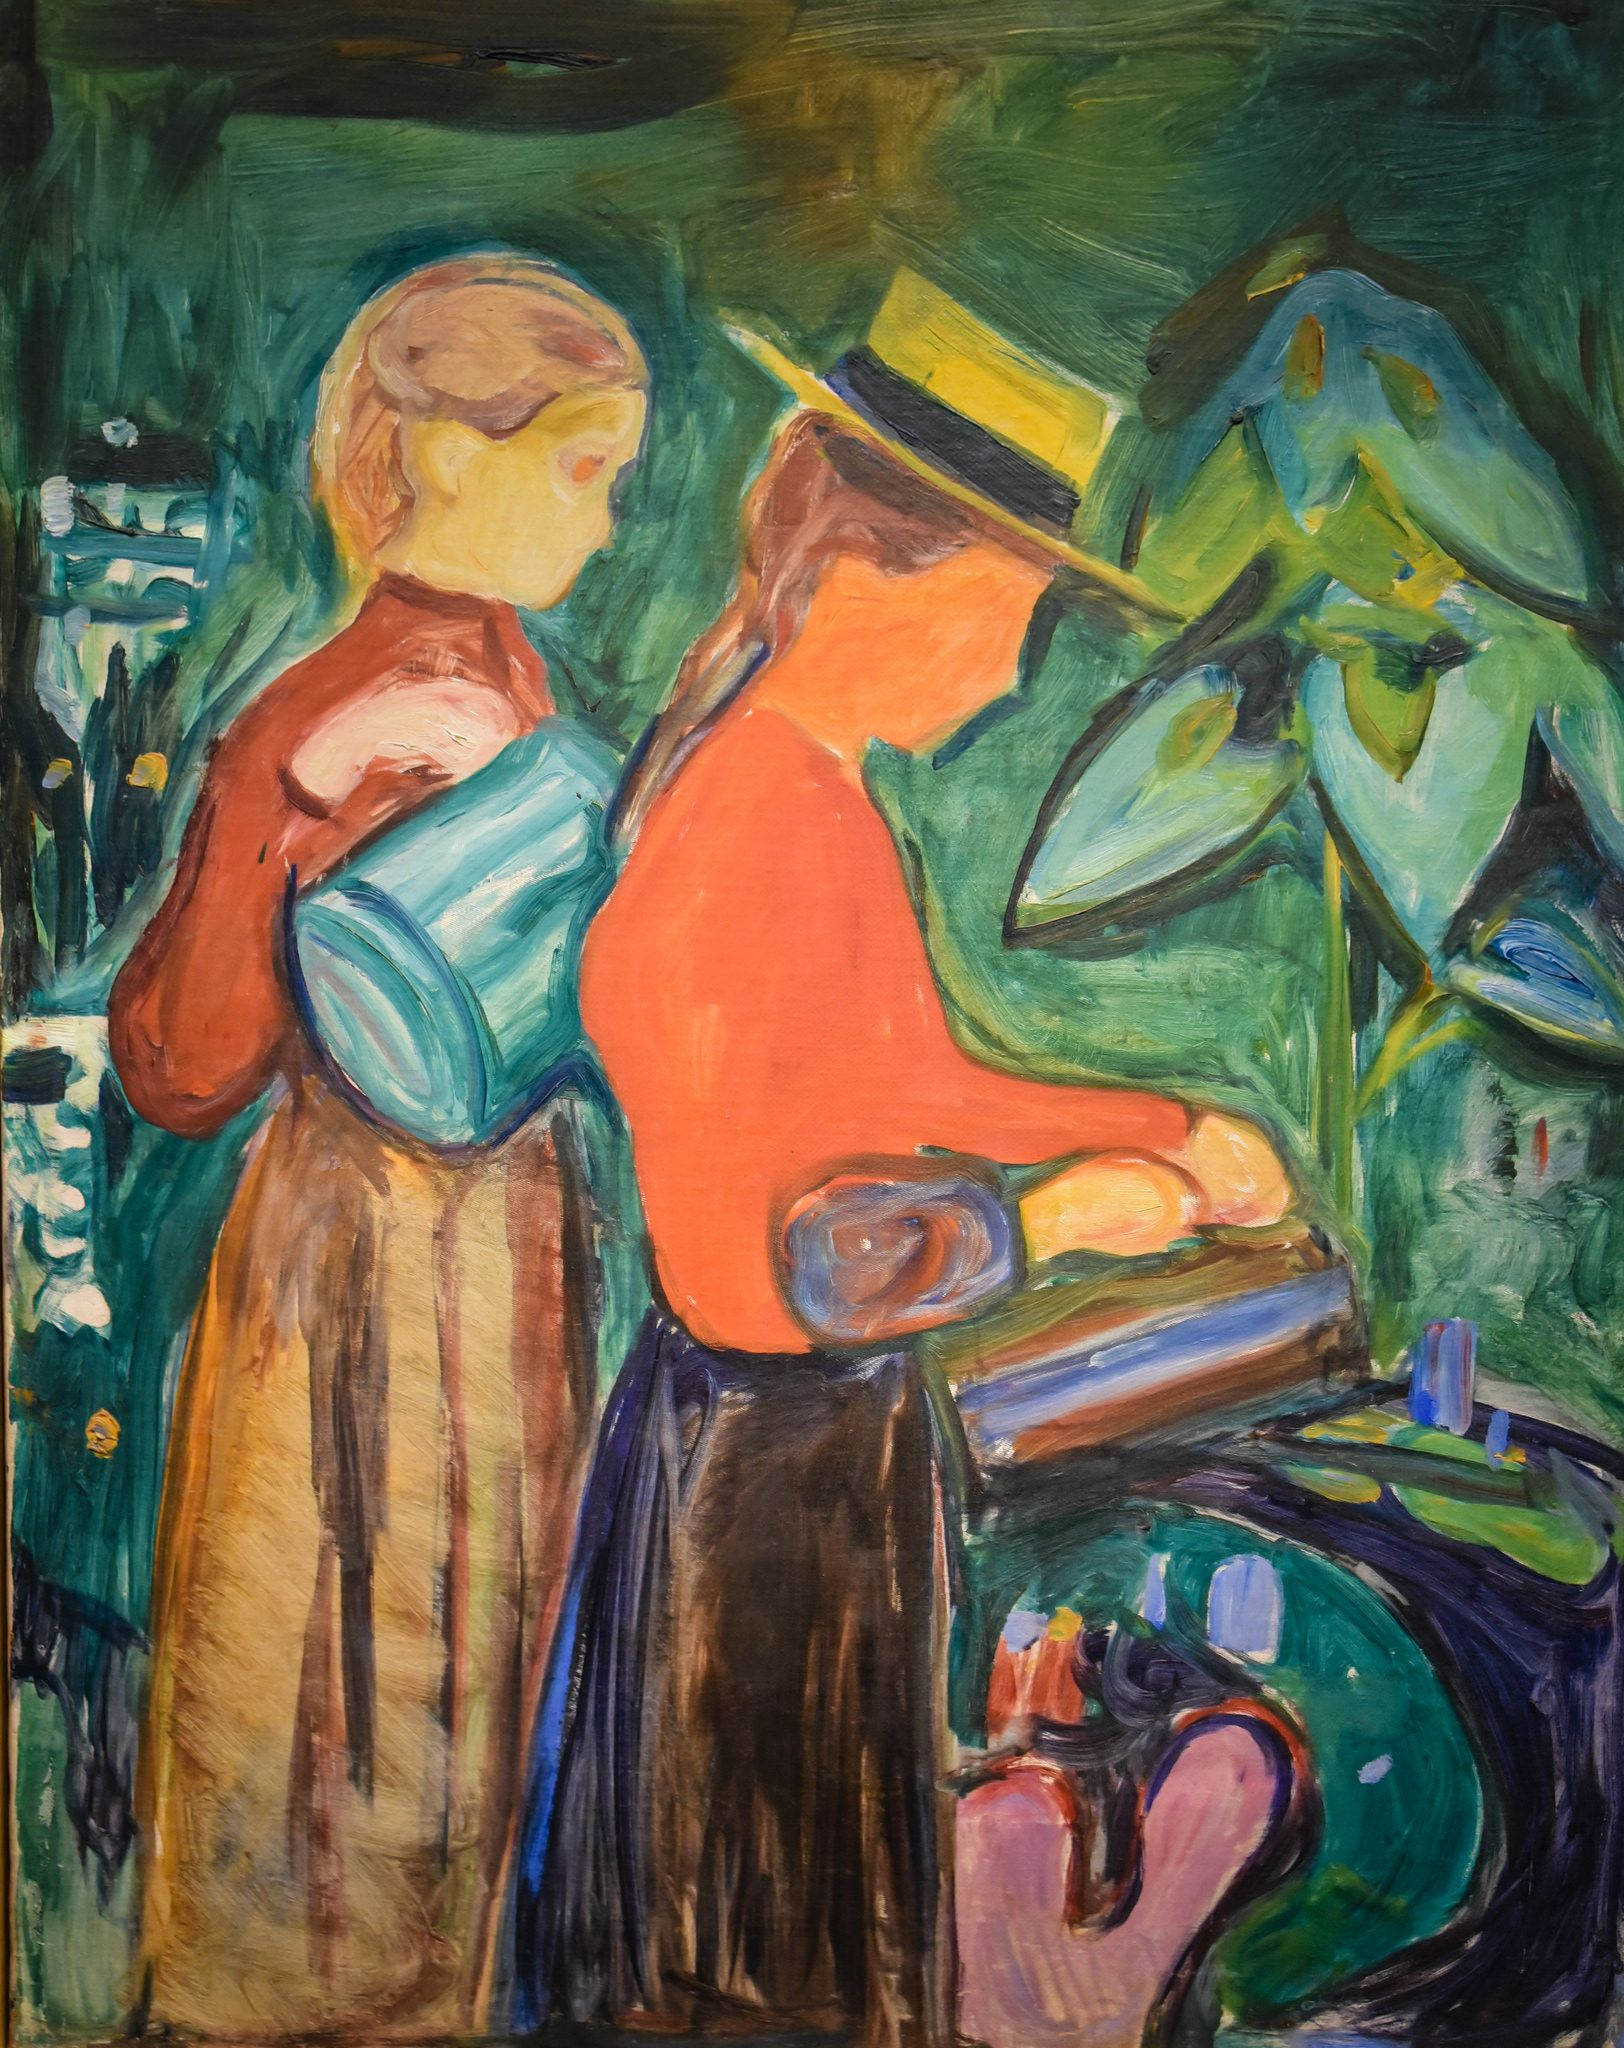 https://flic.kr/p/UW1Shp | Edvard Munch - Girls Watering Flowers, 1904 at Munchmuseet Oslo Norway | Edvard Munch - Girls Watering Flowers, 1904 at Munchmuseet Oslo Norway